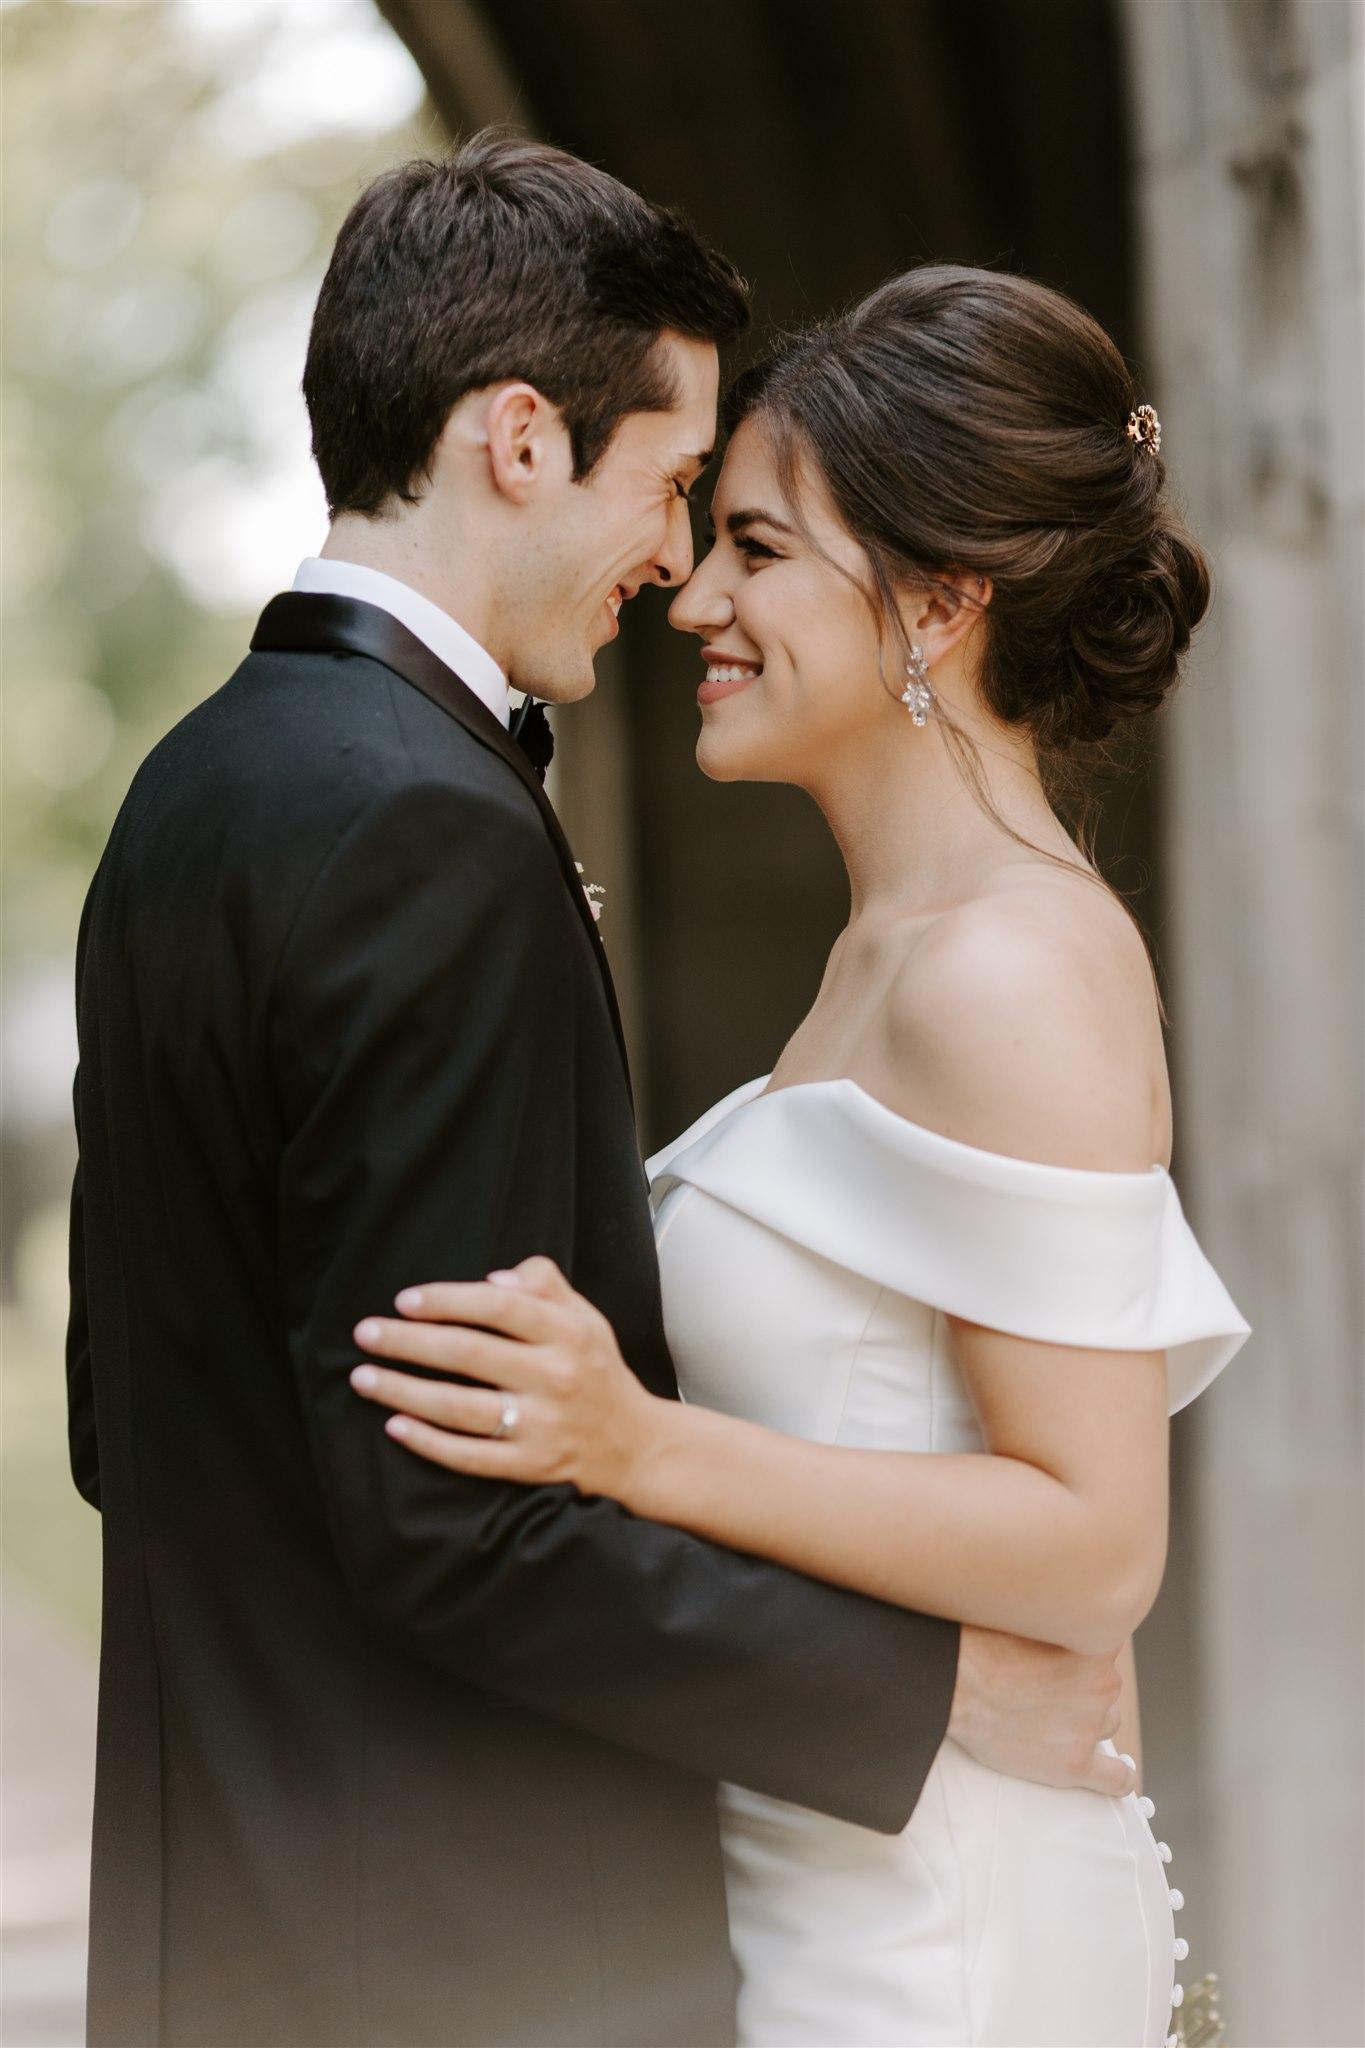 Caitilin Steva Wedding Photography